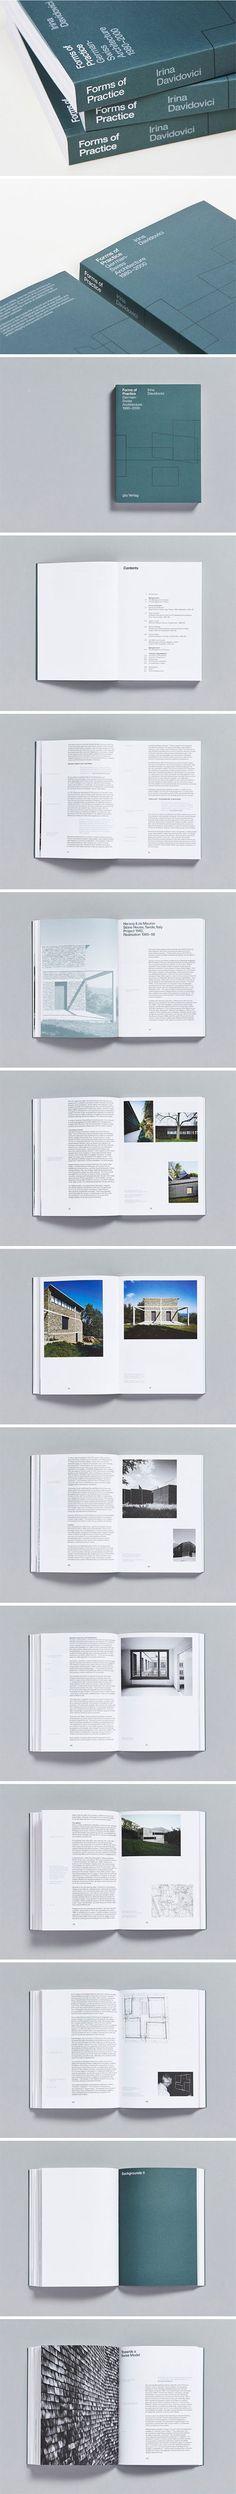 GTA Verlag - Forms of Practice :: Cartlidge Levene :: http://cartlidgelevene.co.uk